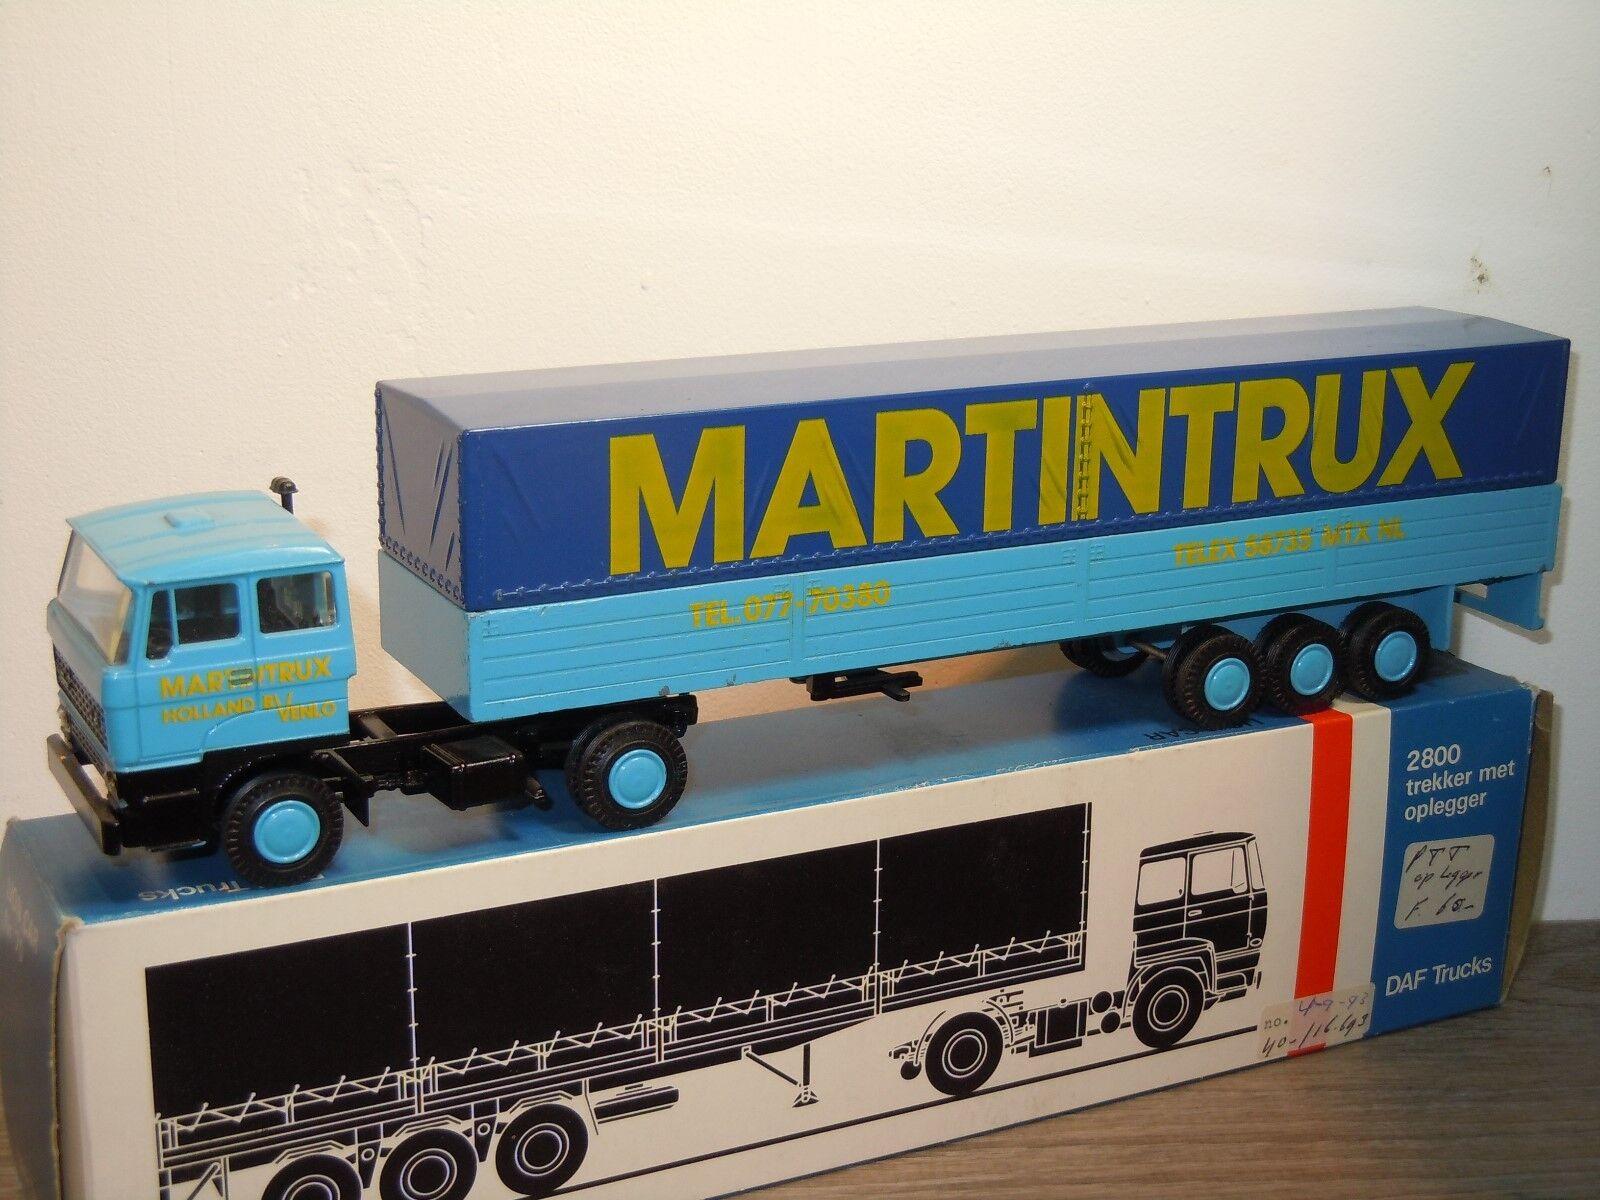 Daf 2800 met Oplegger Martintrux - Lion Car Holland 1 50 in Box 34981